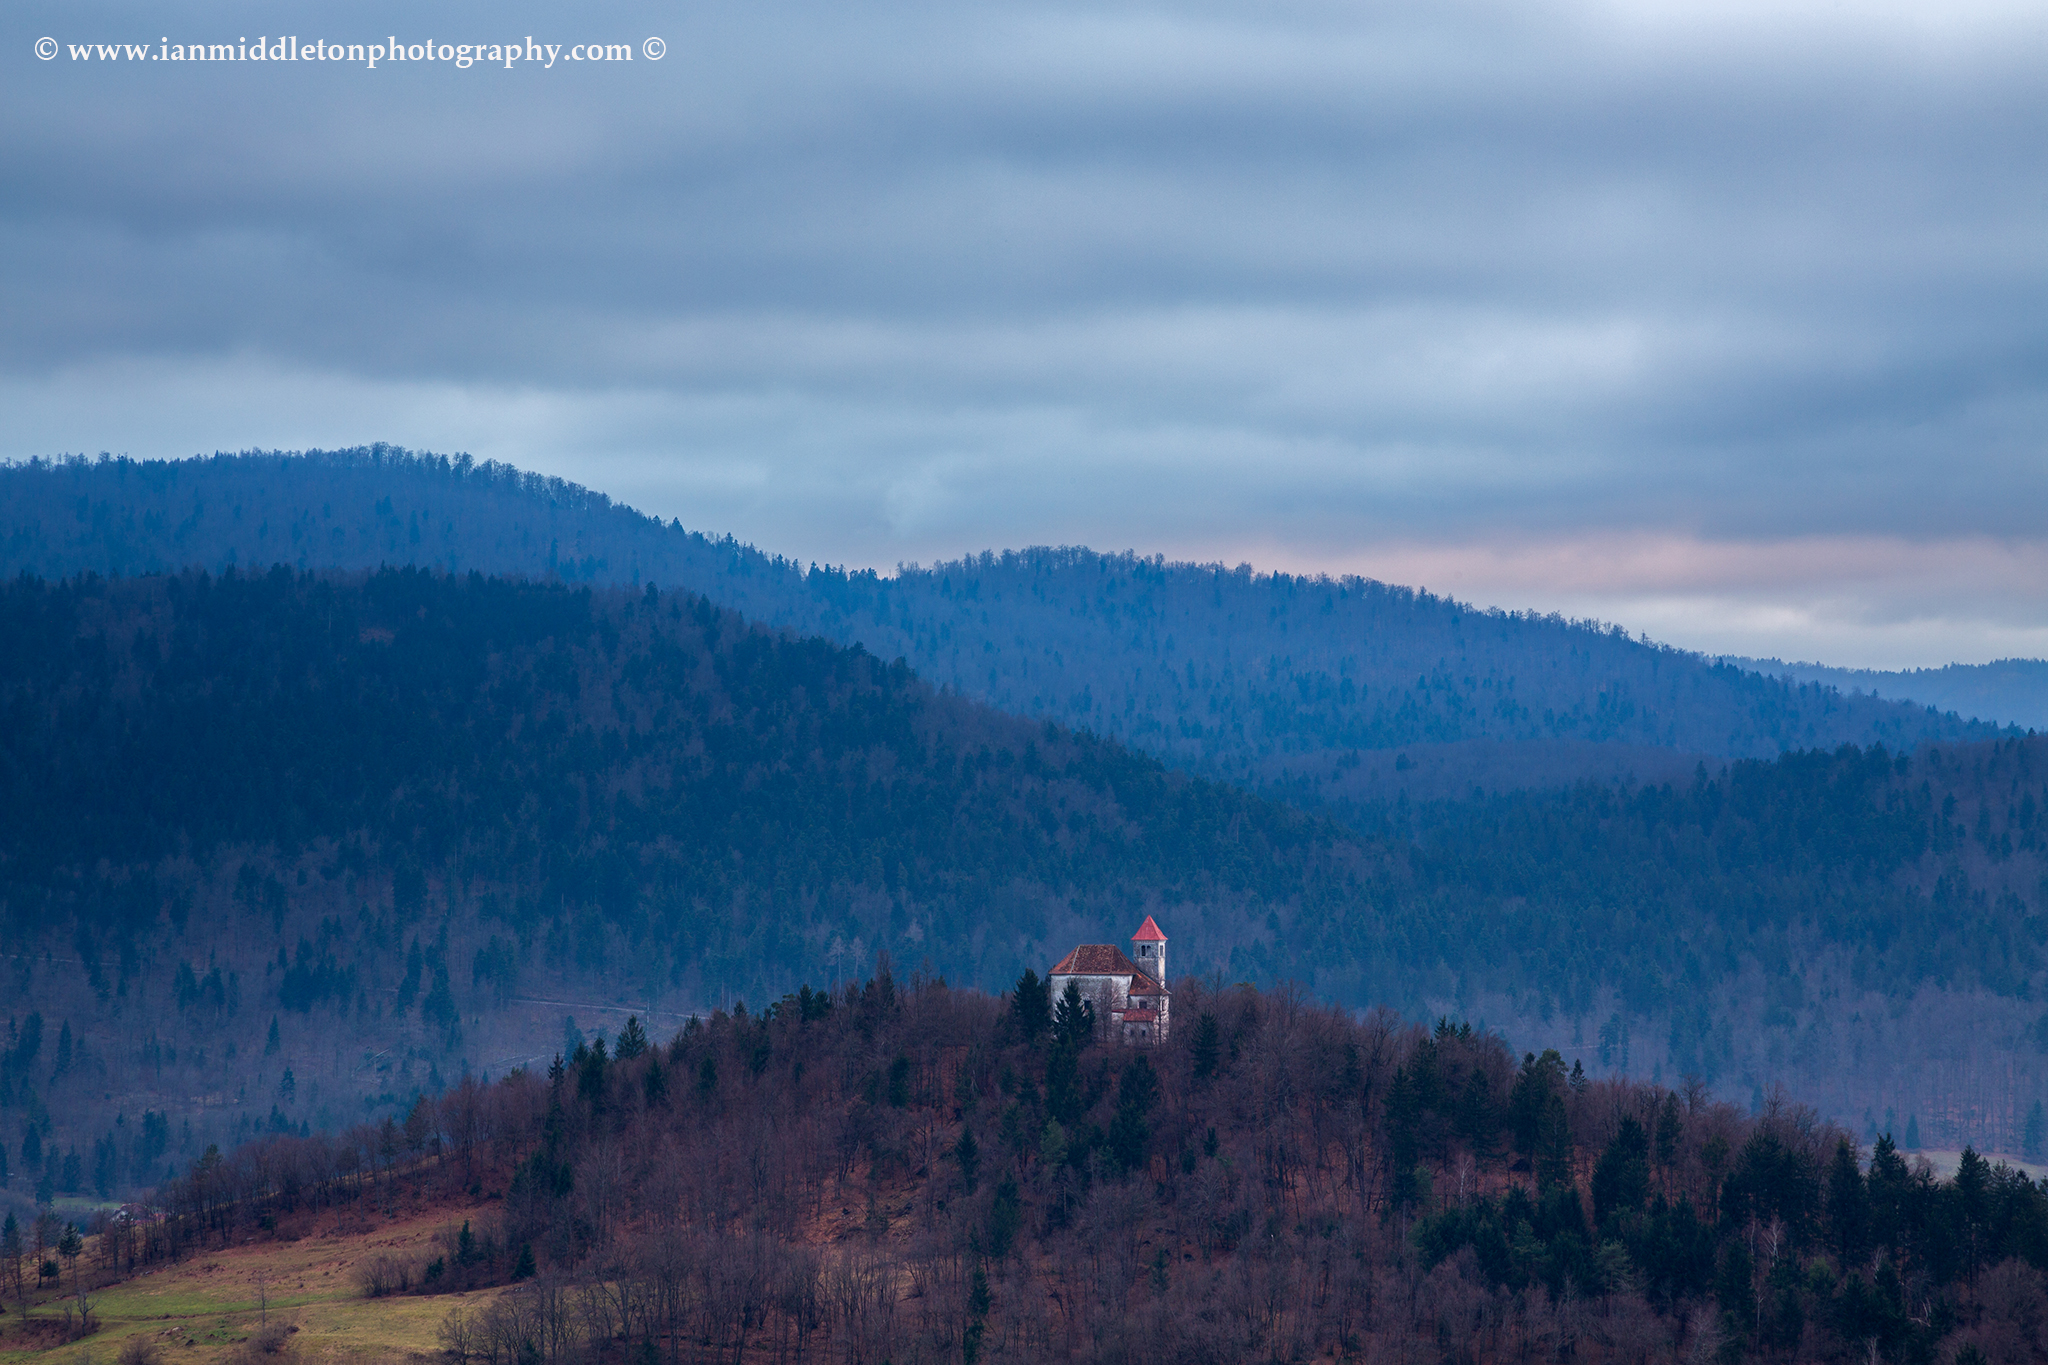 The church of Sveti Josef (Saint Joseph), Slovenia. Seen from the church of Saint Anna (Sveta Ana). Sveta Ana is perched upon an exposed hill overlooking the Ljubljansko Barje (Ljubljana moors) near the village of Preserje.